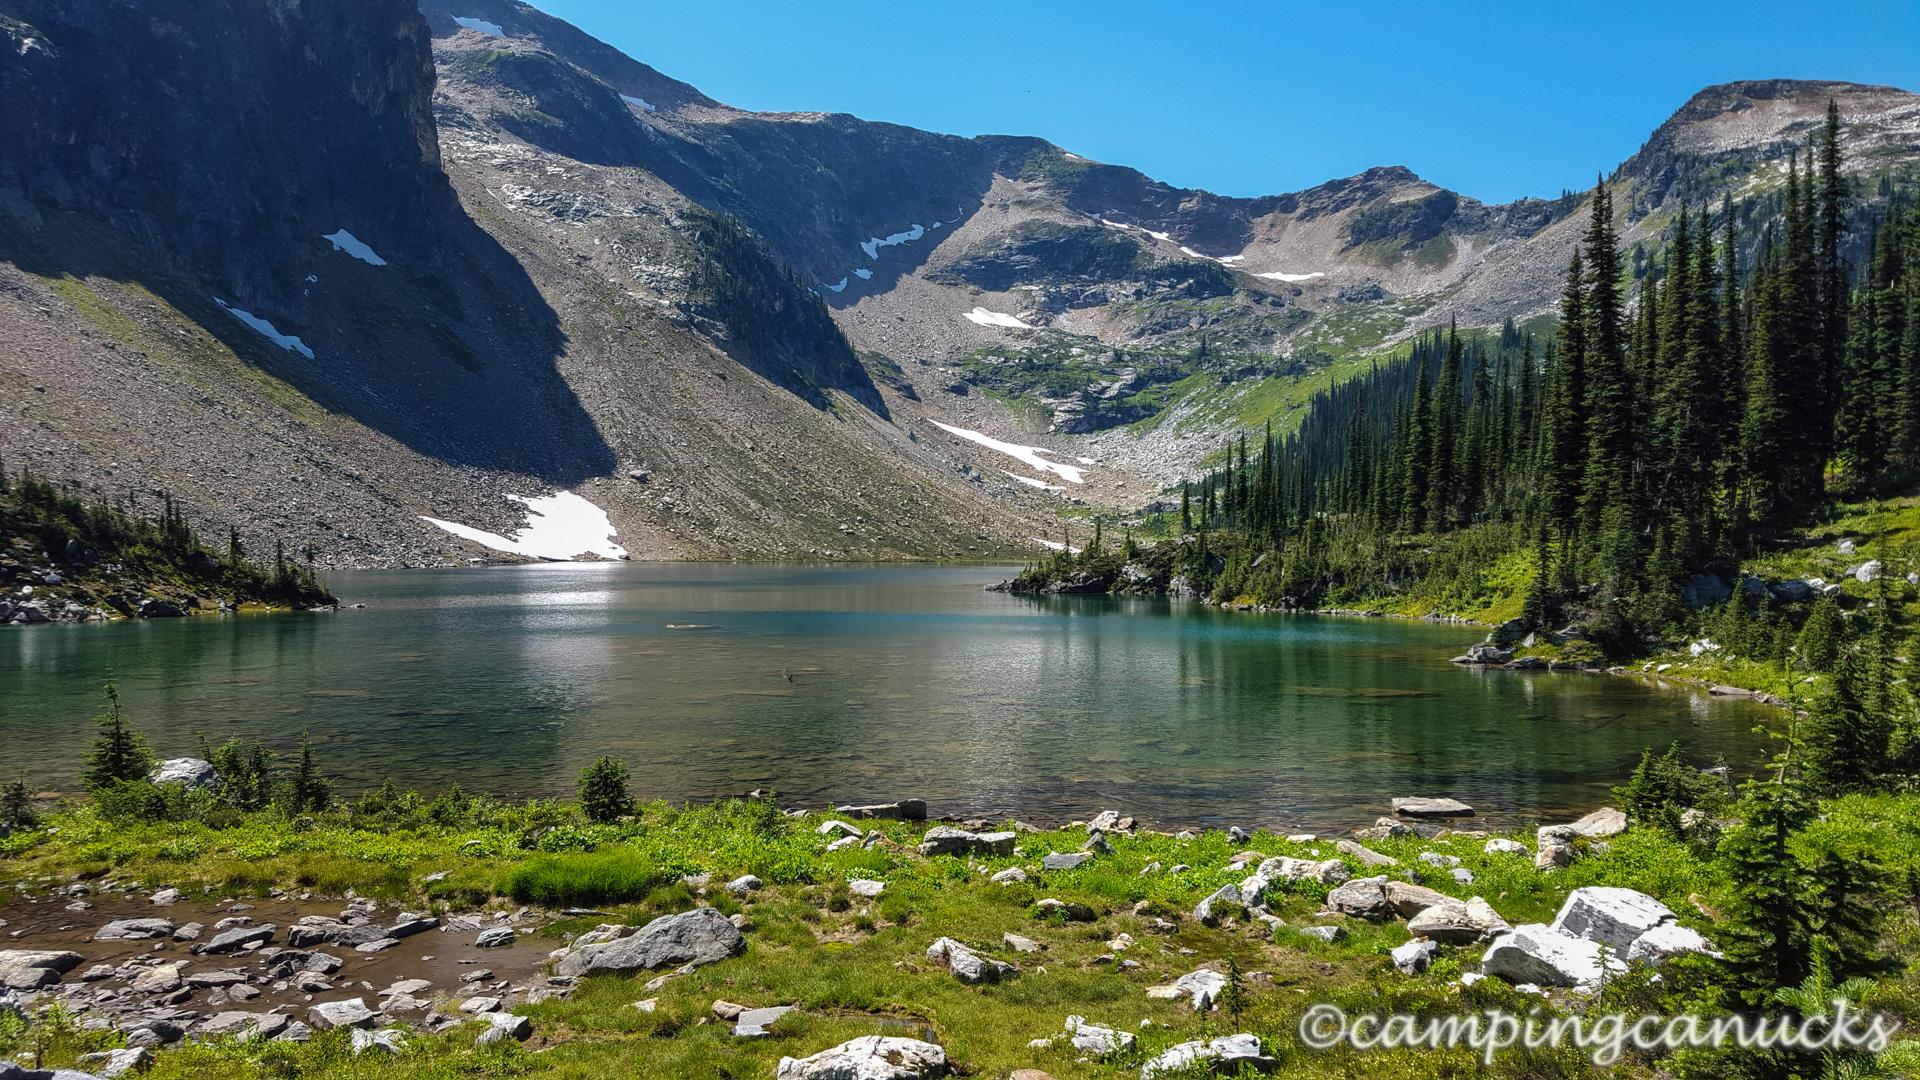 Jade Lakes Trail Mount Revelstoke National Park The